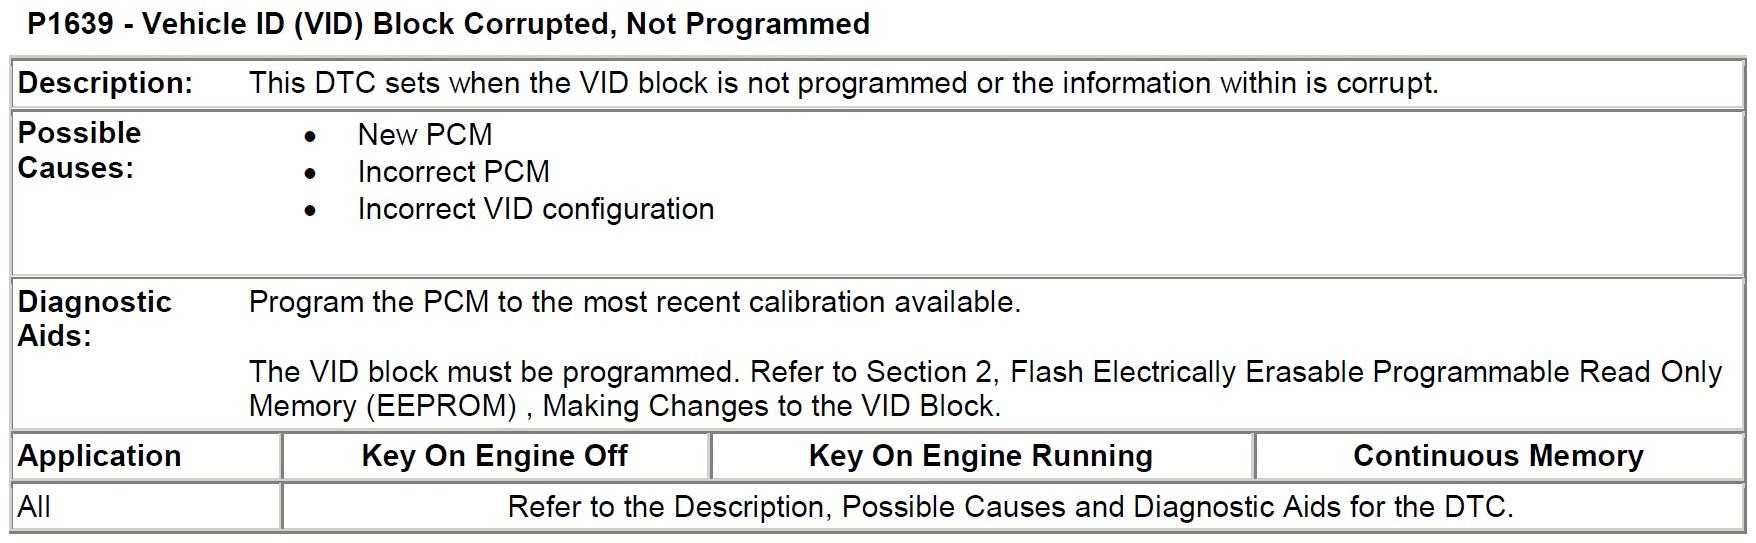 P0300 help | Page 2 | SVTPerformance com